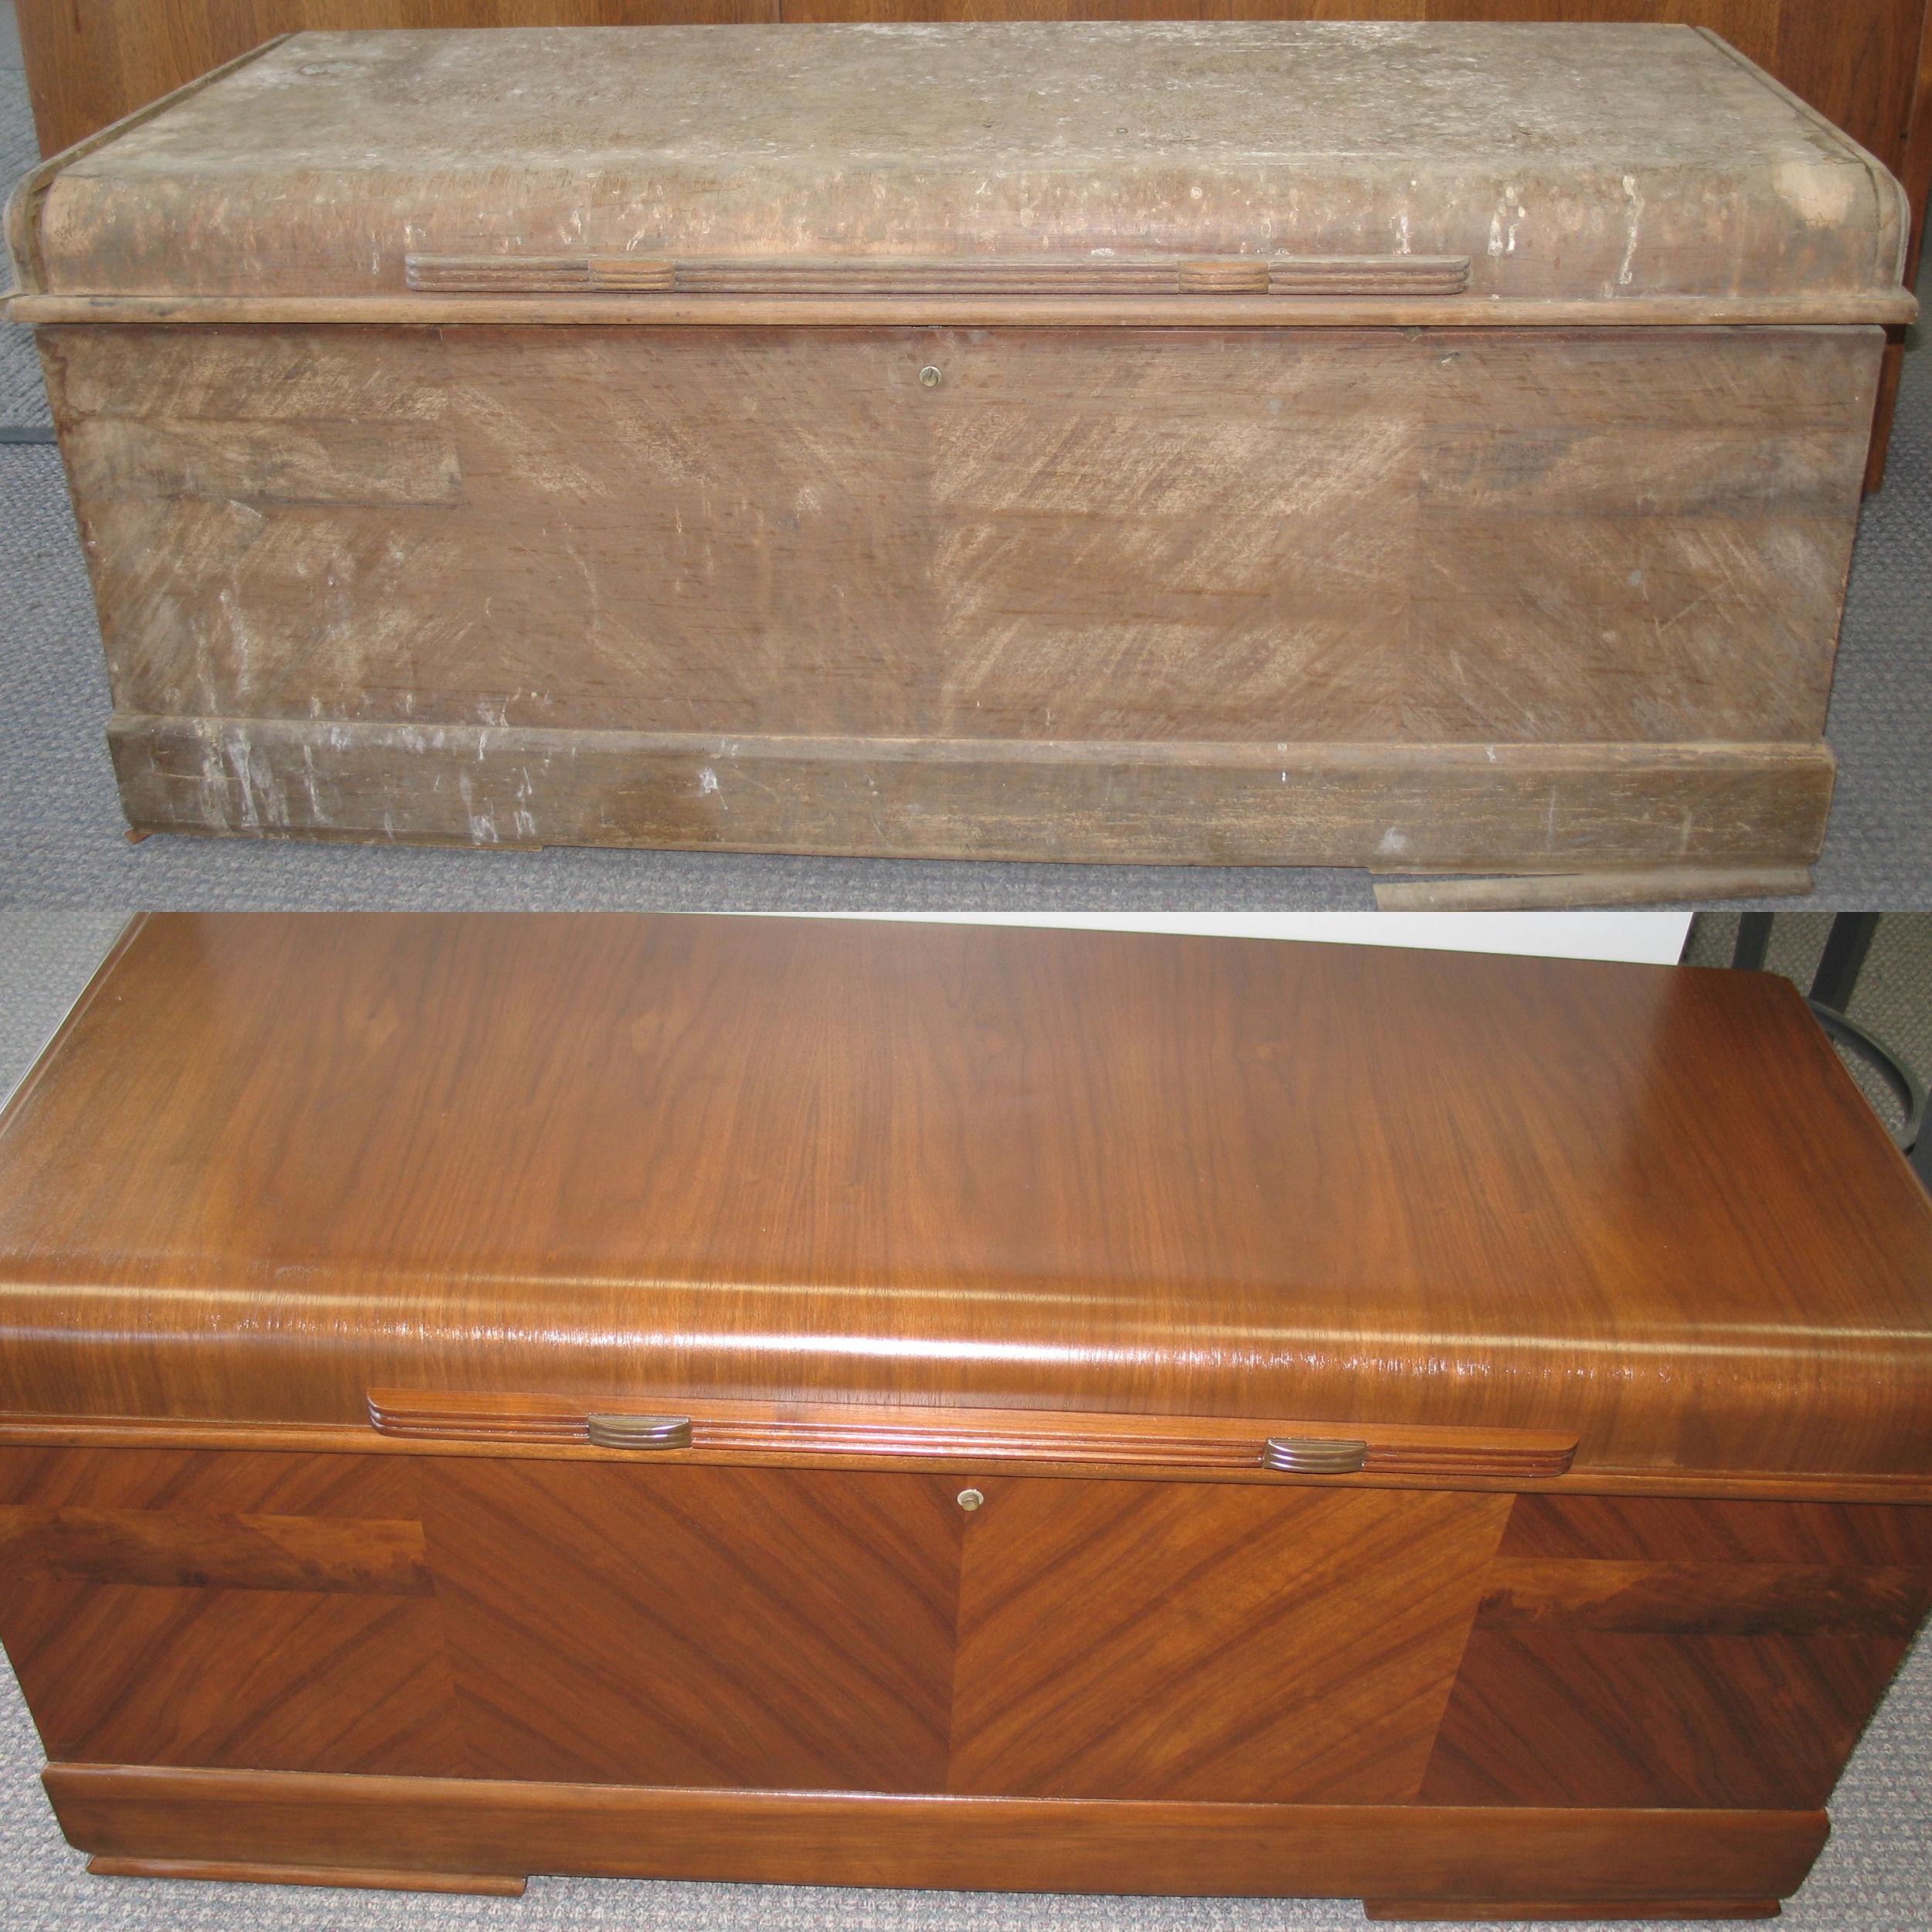 Furniture Repair By Weathersby Guild, Glendale Arizona